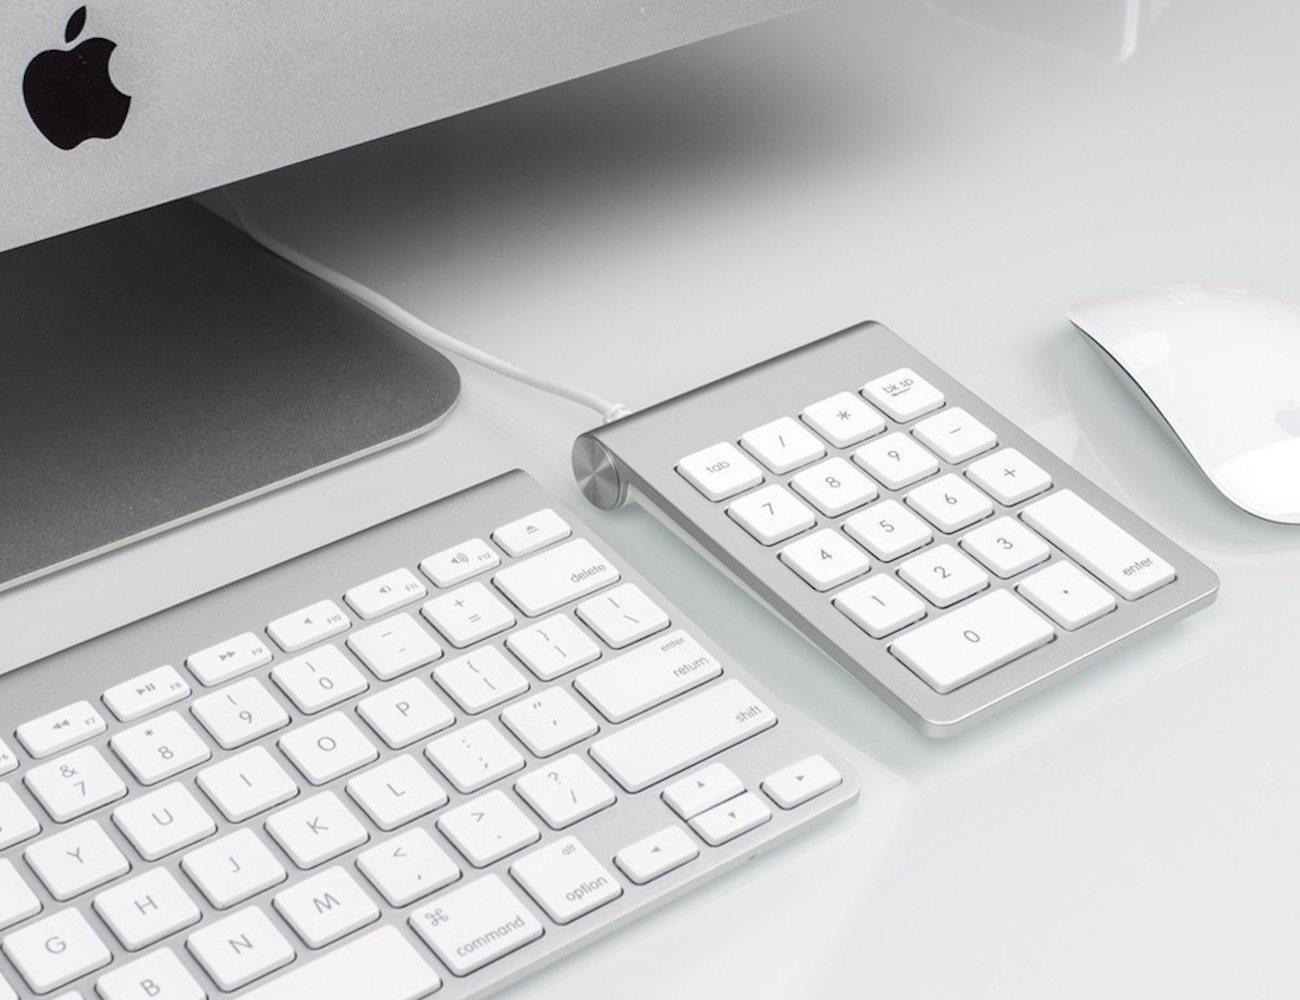 Satechi Aluminum USB Numeric Keypad